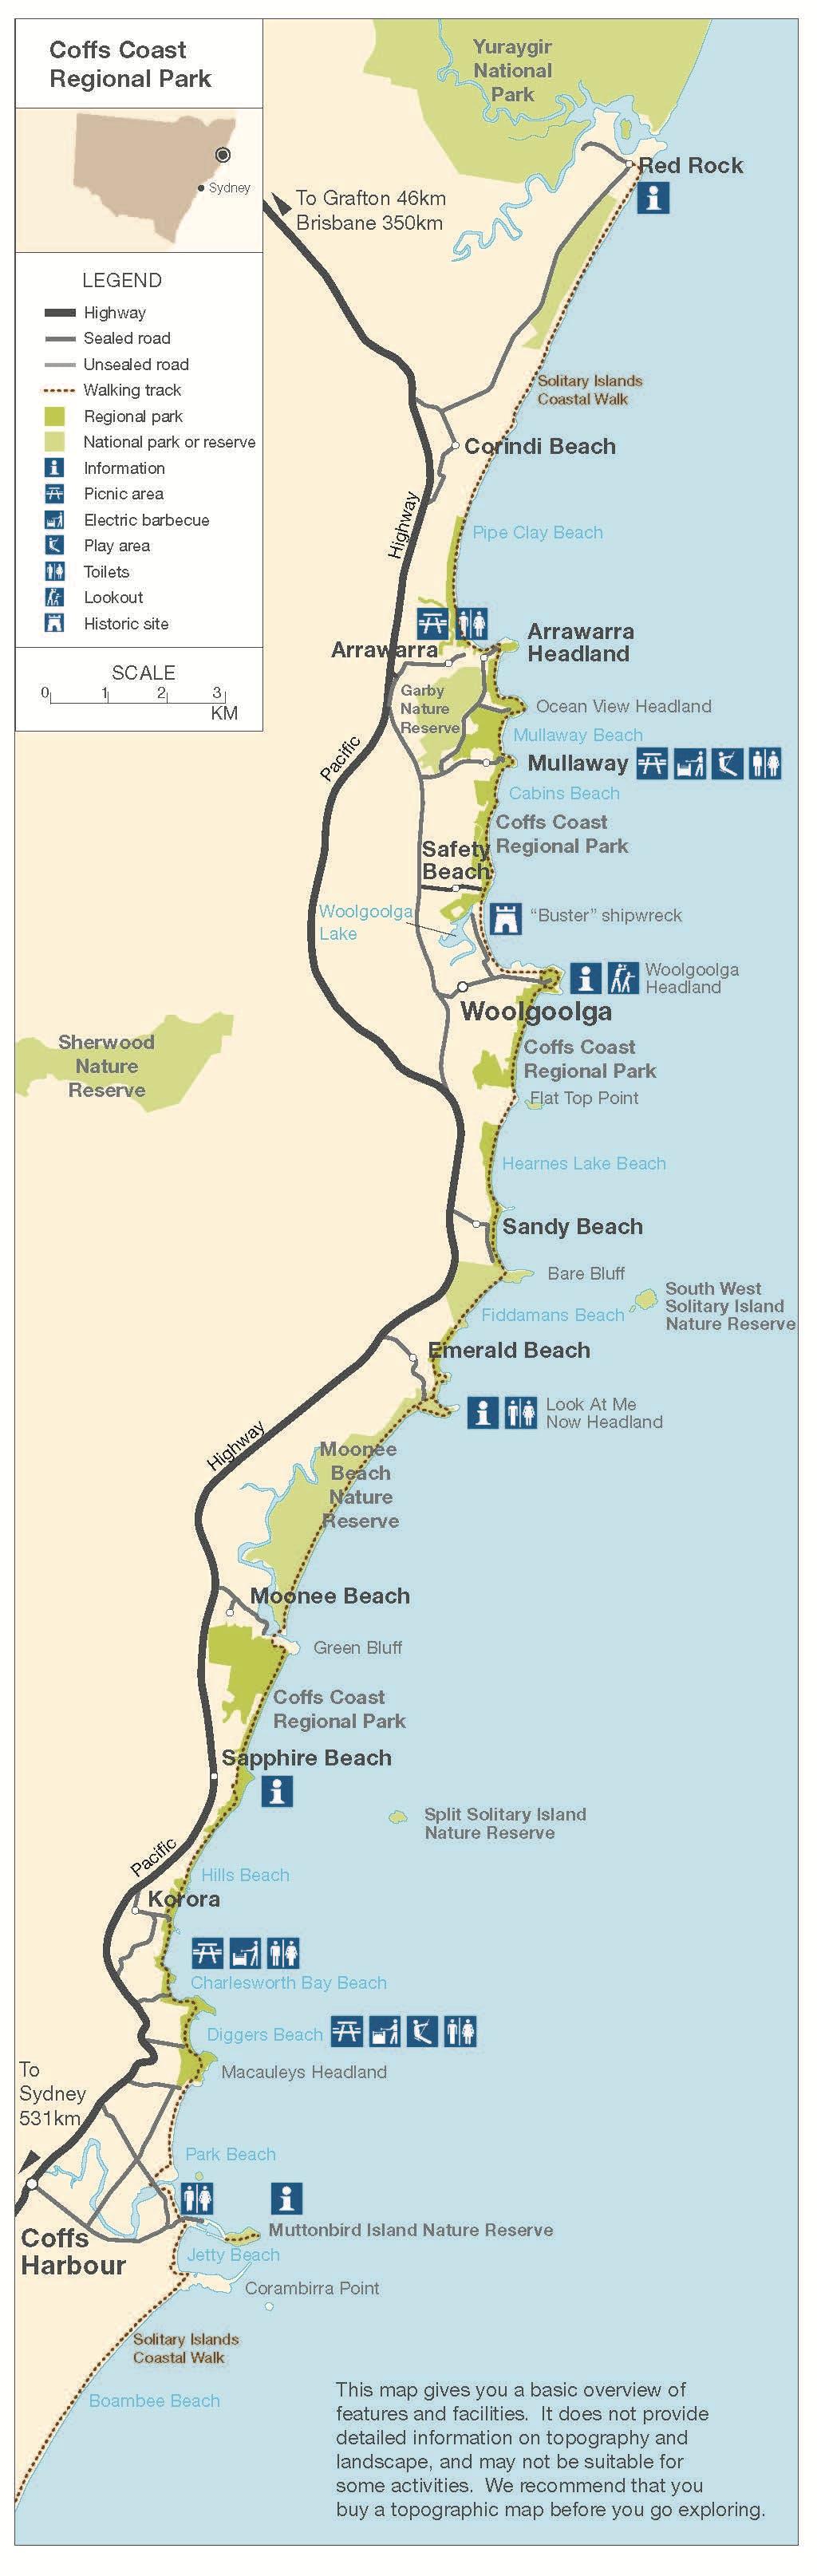 coffs-coast-regional-park-map